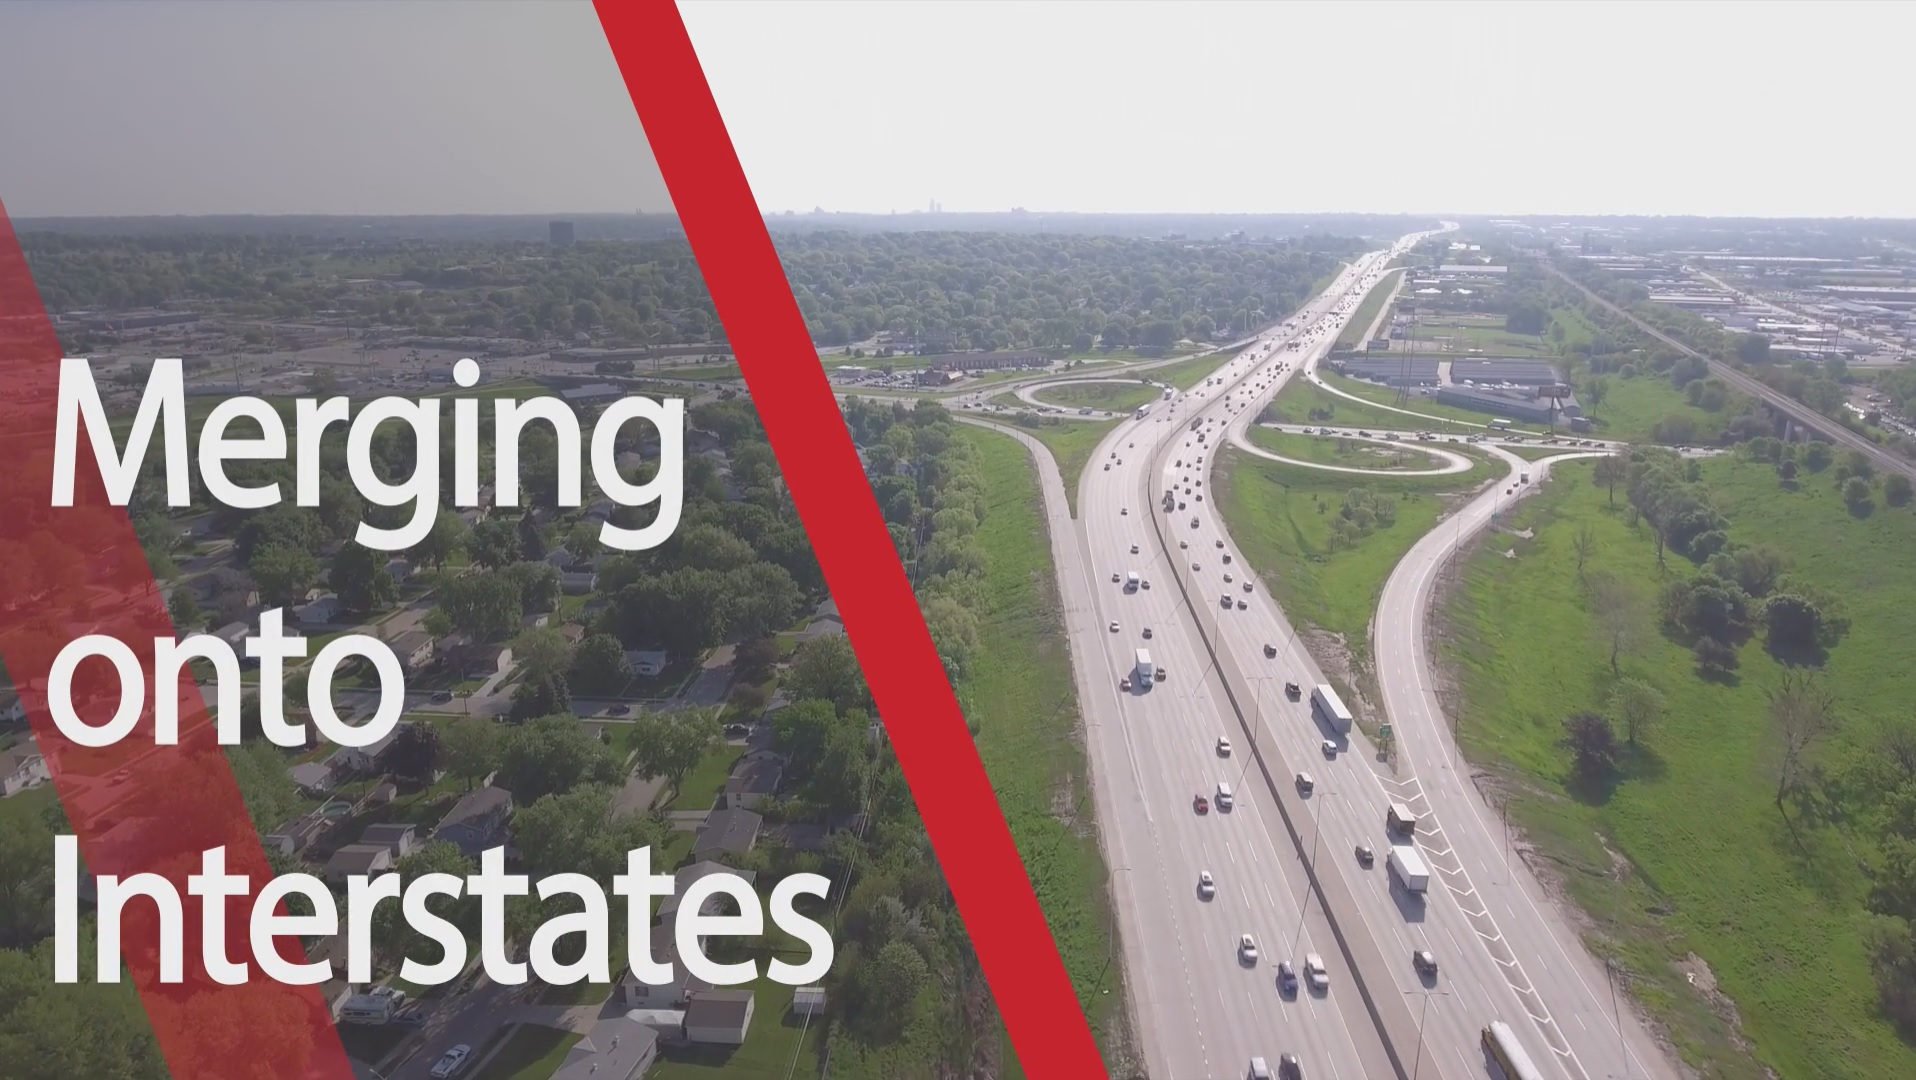 Frost Media Group Omaha Video Campaign Sales Cornhusker Driving School Drone Brand Marketing Viral Nebraska Subliminal Stimuli Ad Marketing Segmentation